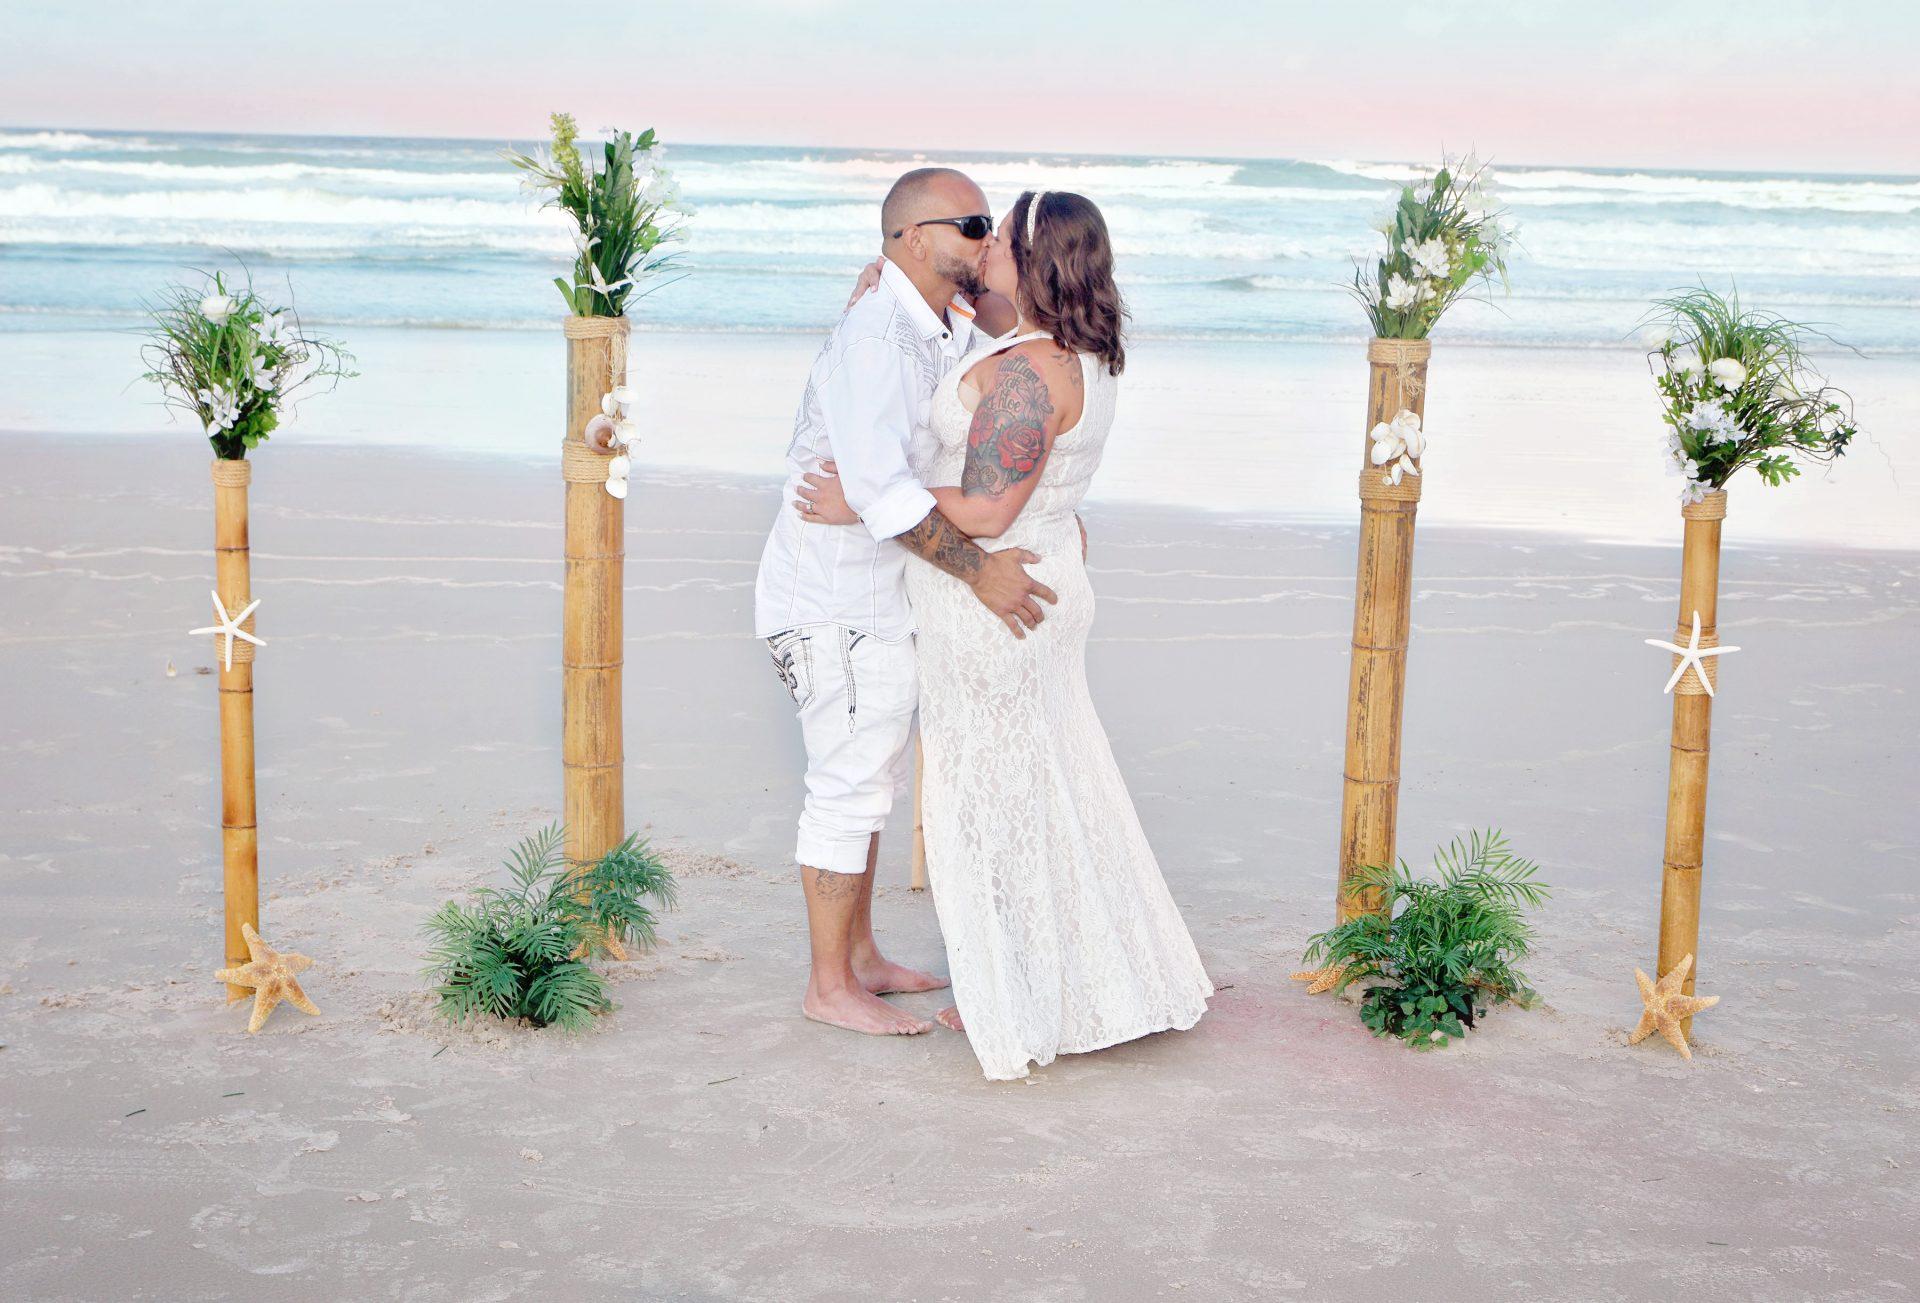 Small Florida beach wedding ceremonies